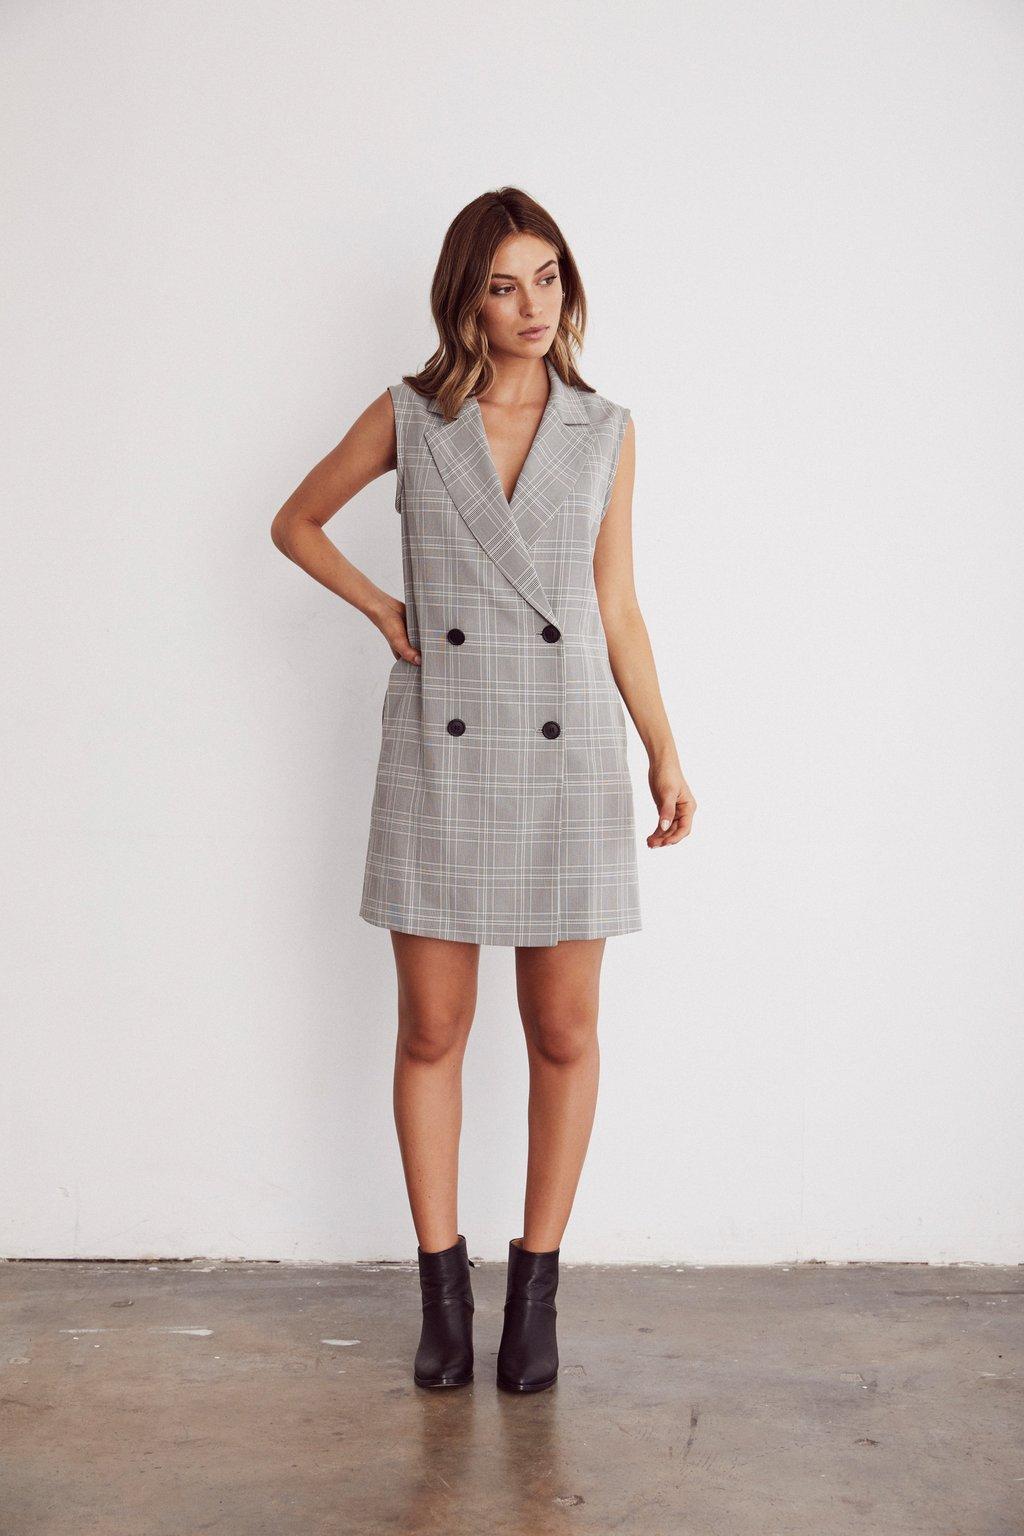 Vetta The Blazer Dress, $244